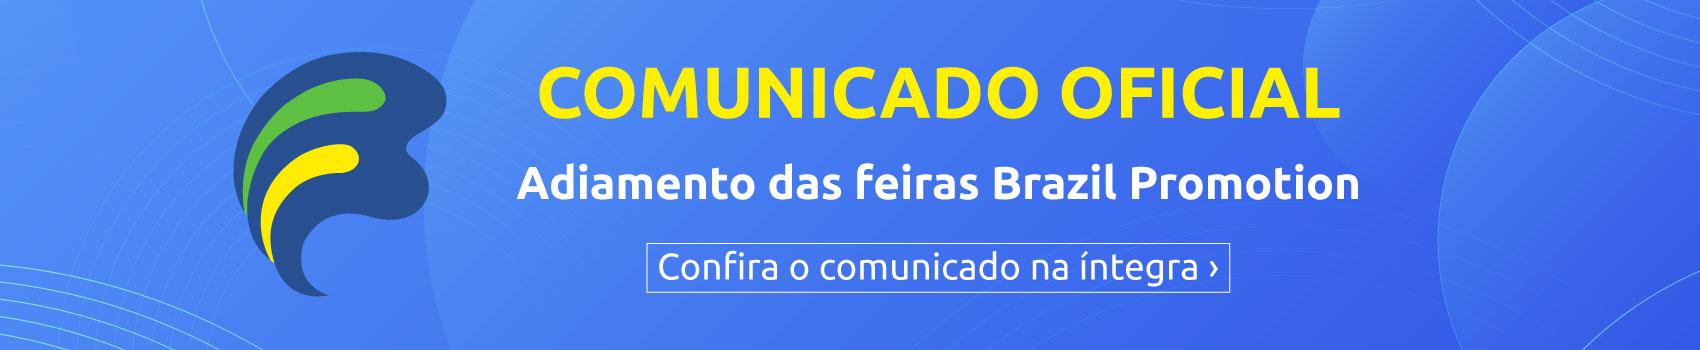 Brazil Promotion nova dada